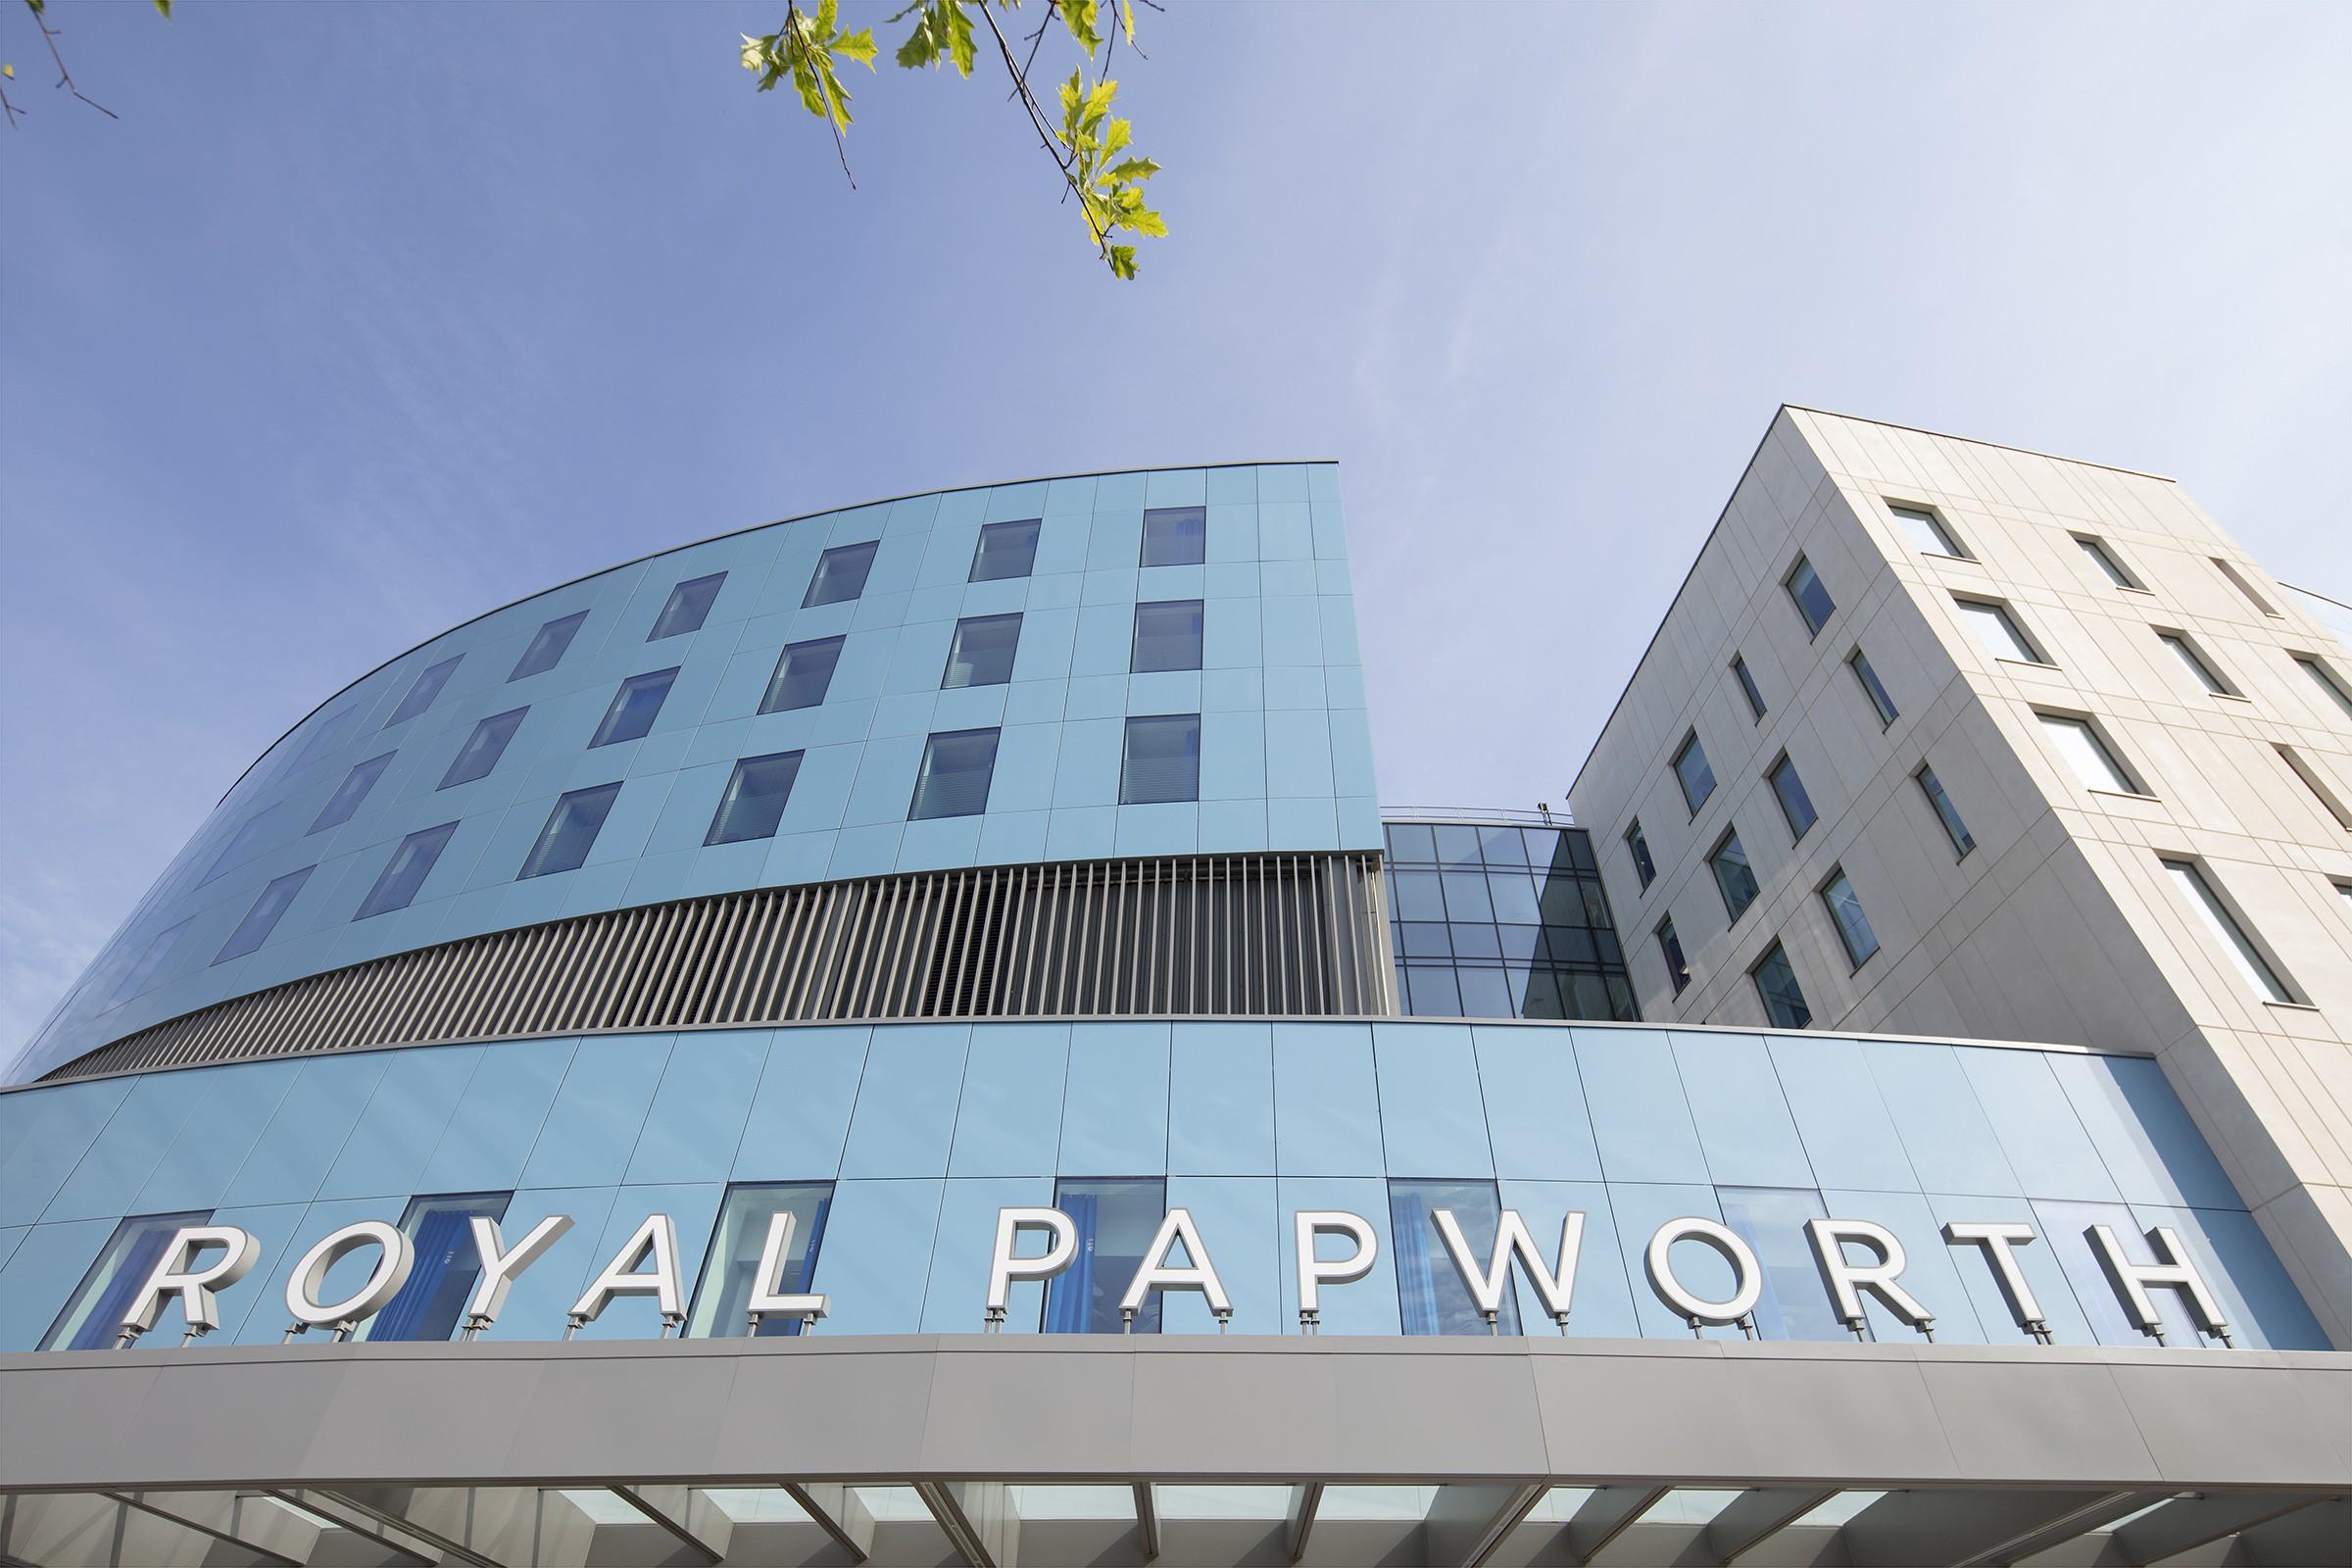 Royal Papworth Hospital